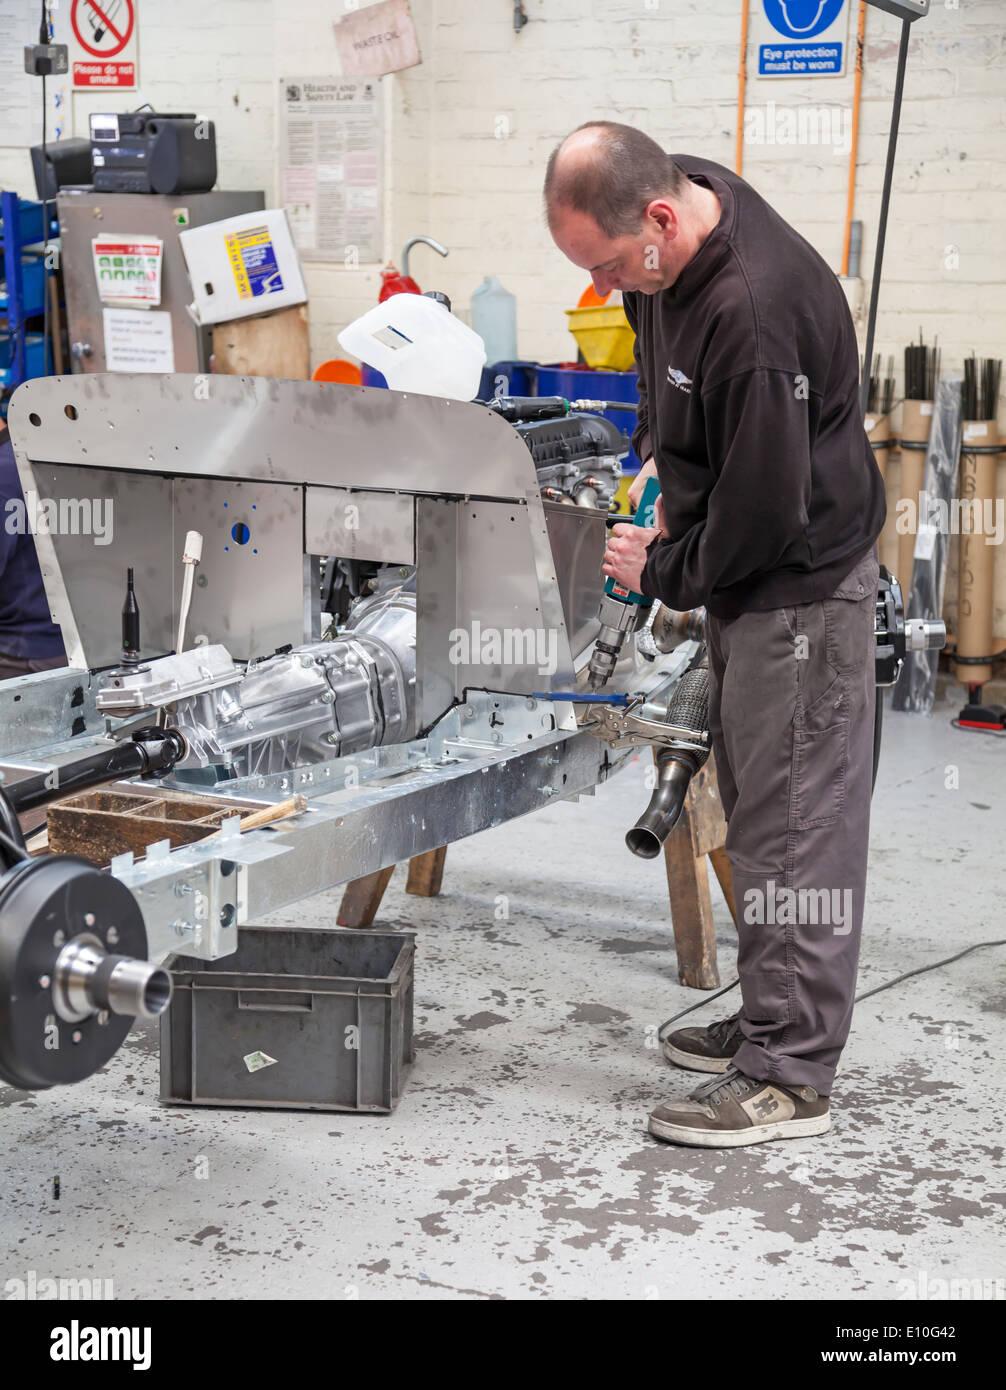 A aluminum chassis of a car at the Morgan Motors Car factory - Stock Image